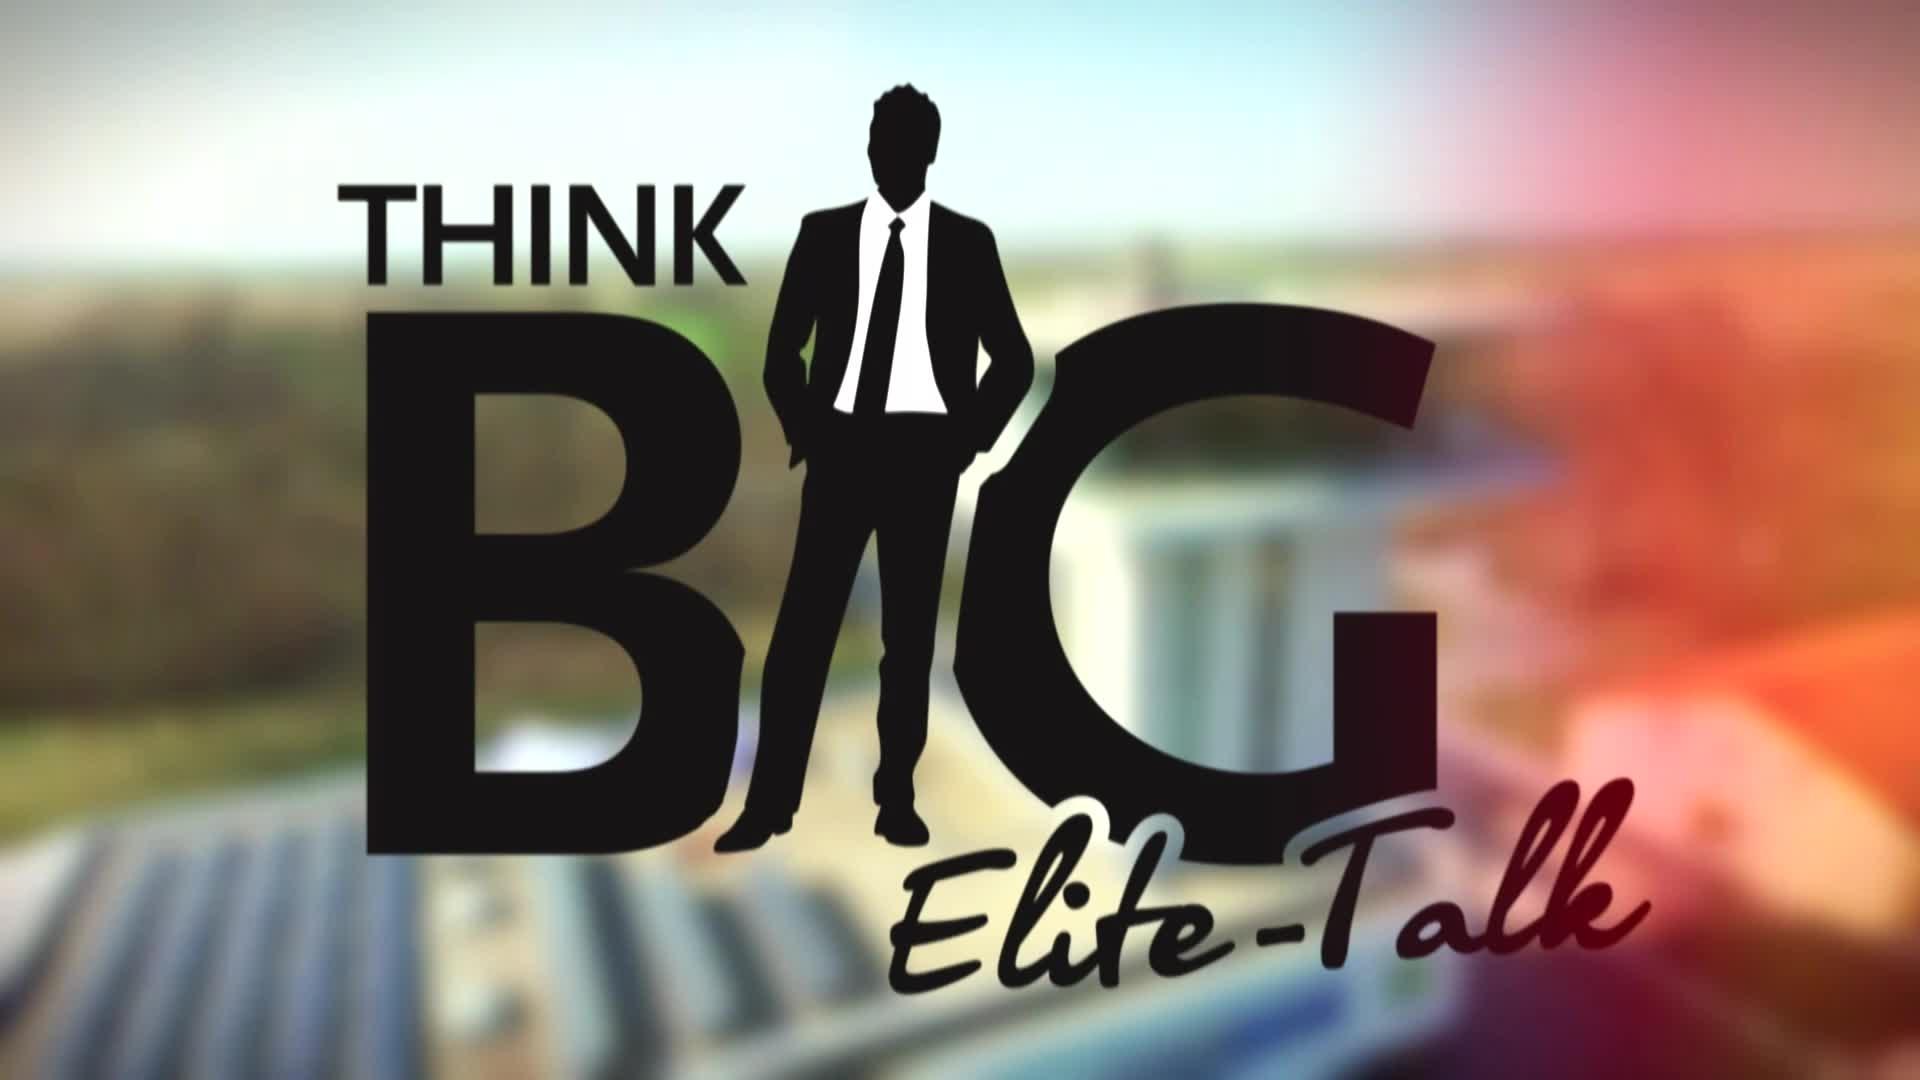 Think BIG - Teaser Martin Millefors